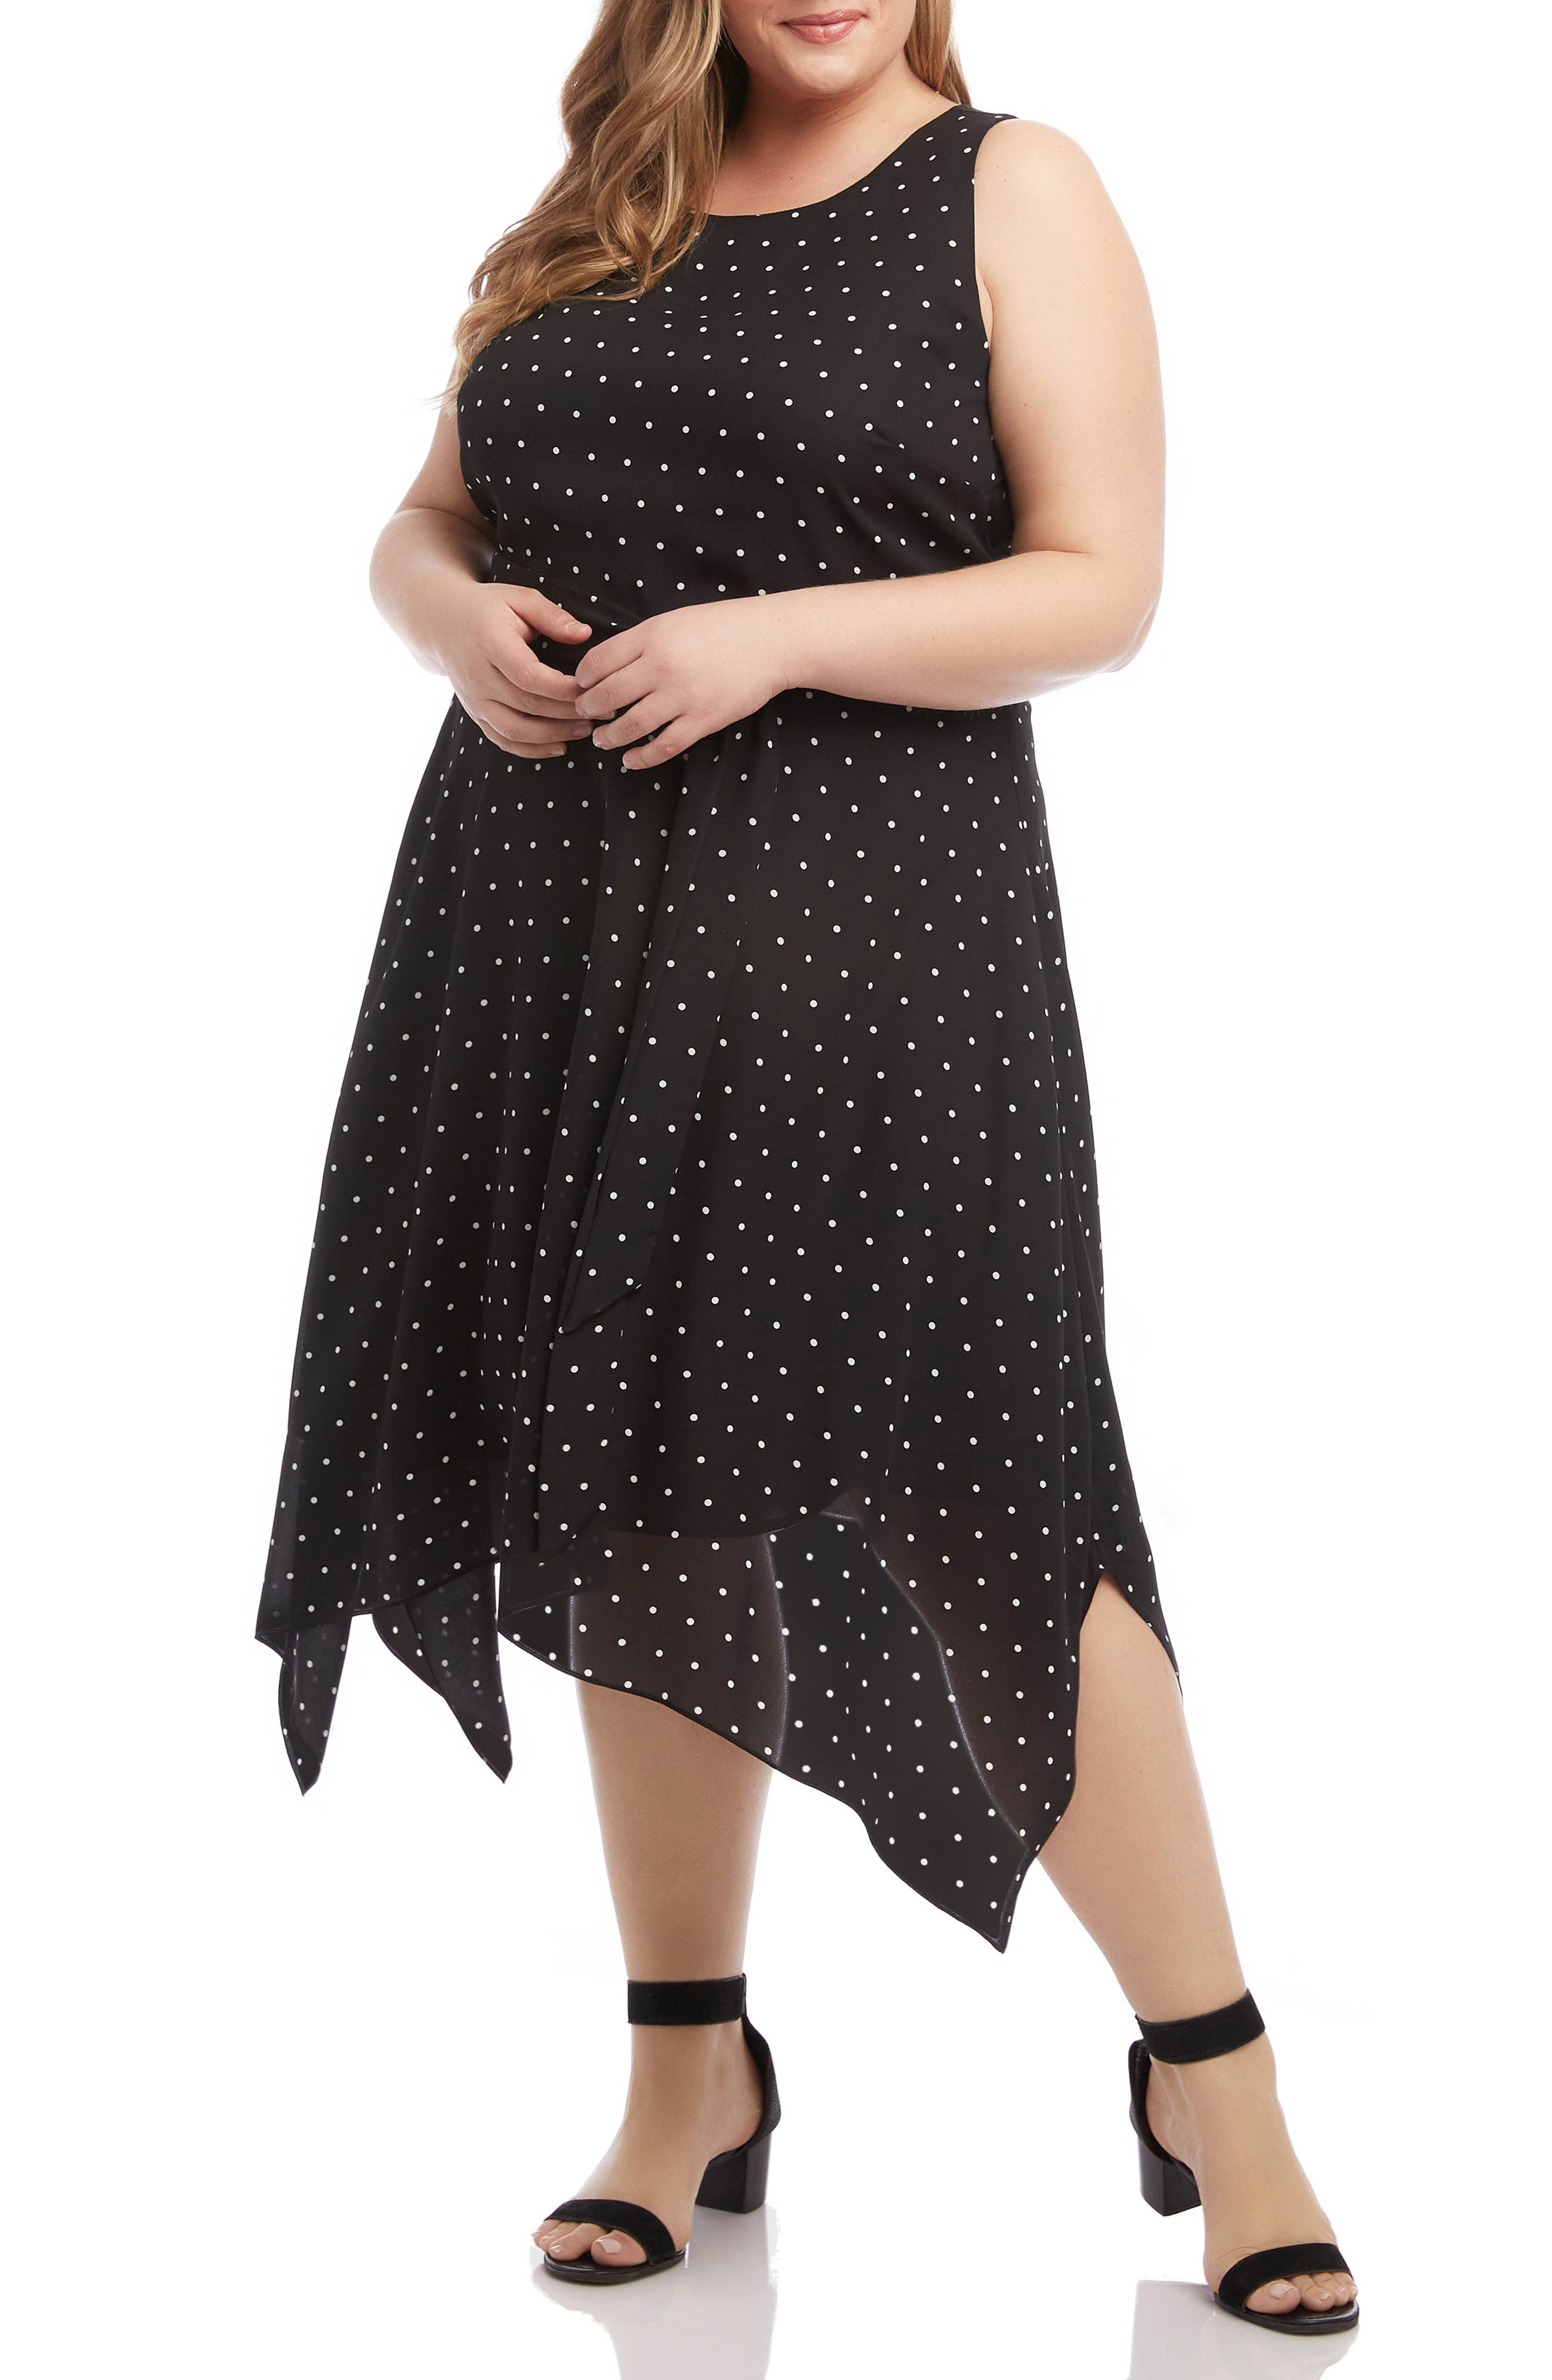 Plus Size Karen Kane Polka Dot Sleeveless Handkerchief Hem Dress, Black